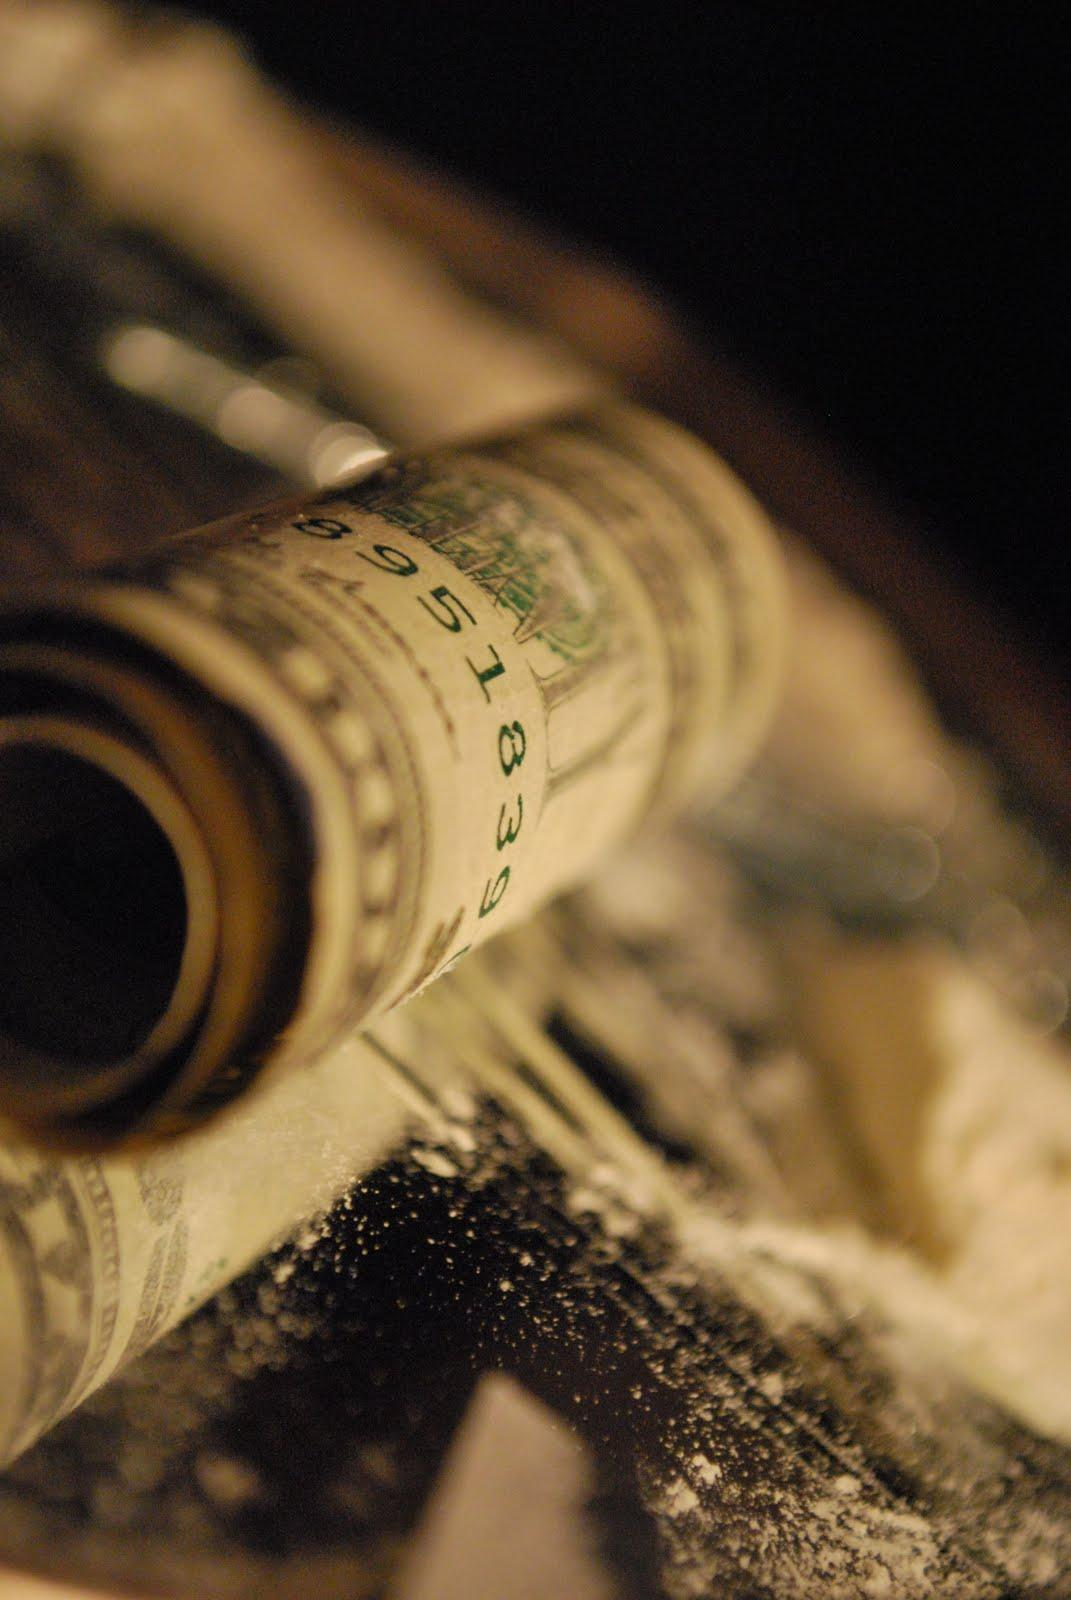 Guns And Money Wallpaper : money, wallpaper, Money, Wallpapers, Wallpaper